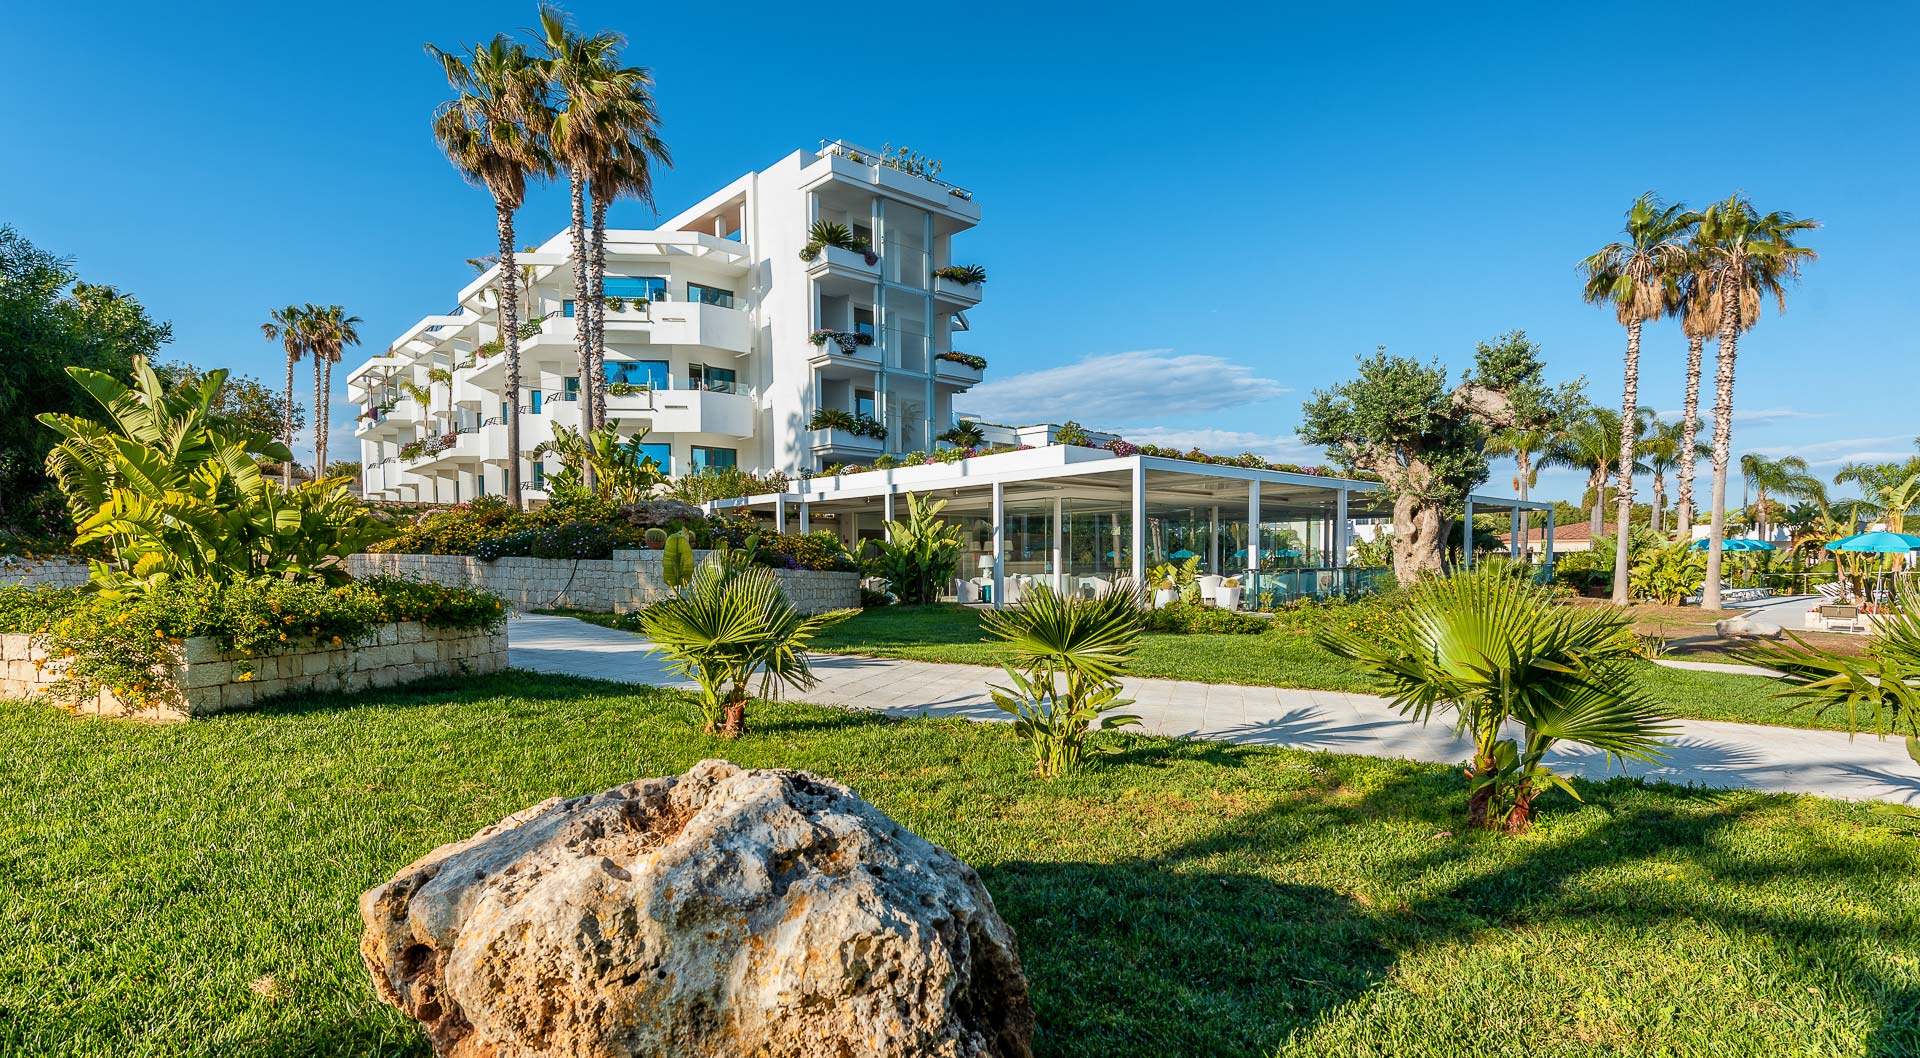 Hotel Marina di Ragusa - Acacia Palace - Marina di Ragusa